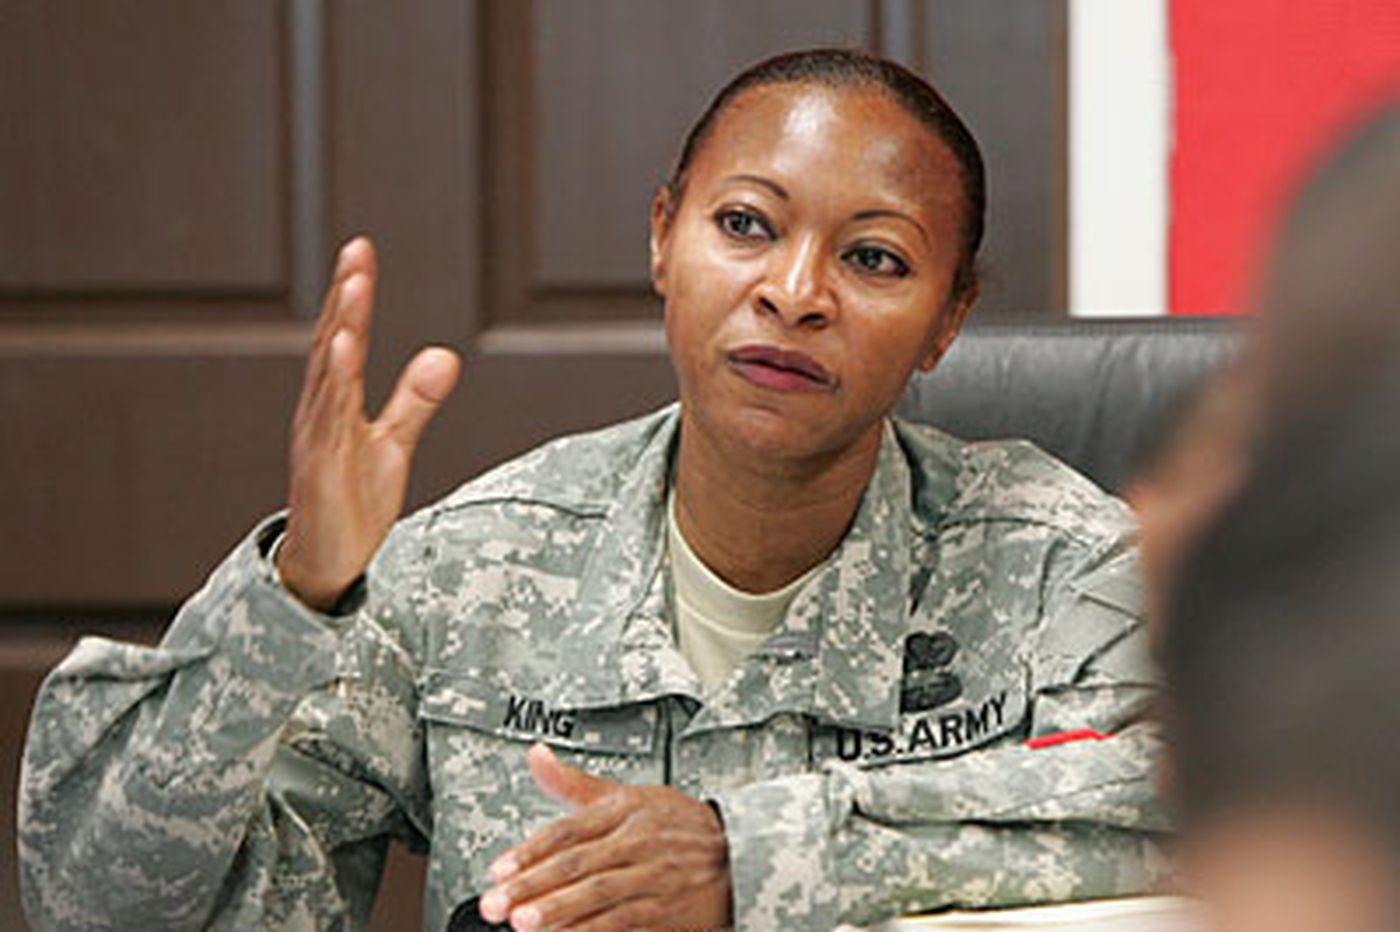 Army sergeant says suspension tied to bias